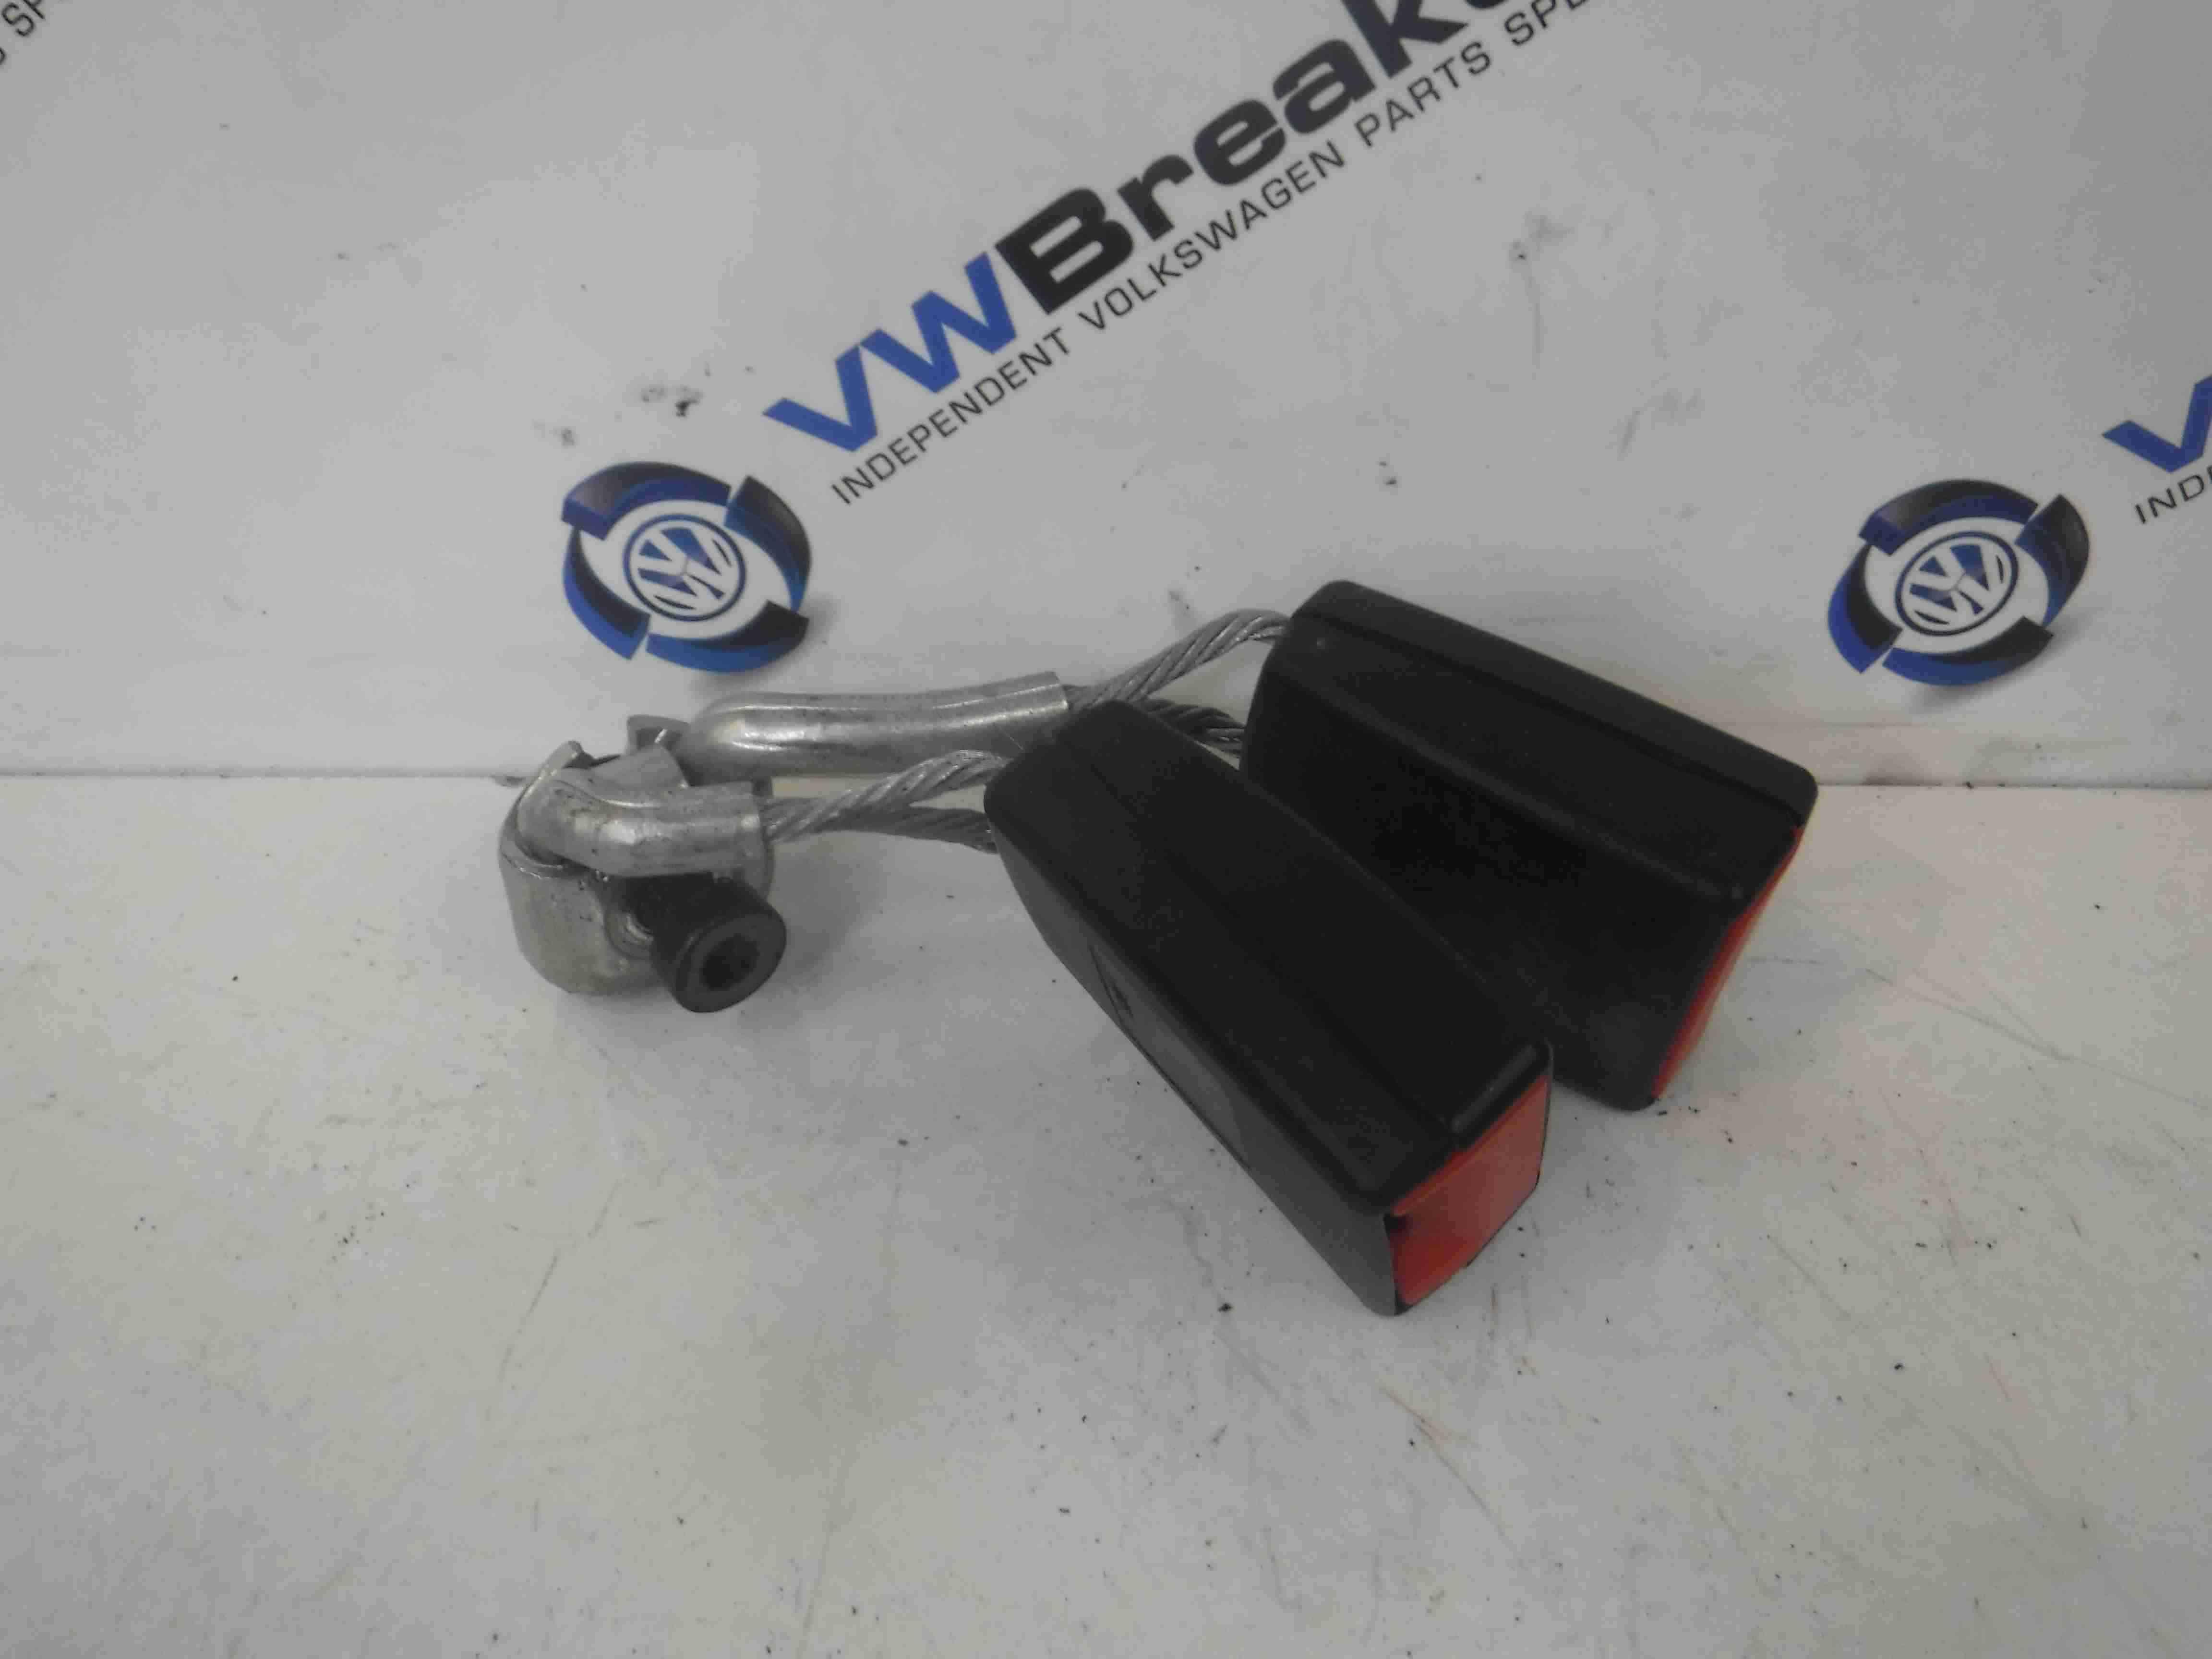 Volkswagen Passat B6 Estate 2005-2010 Passenger NSR Rear Seat Belt Buckle